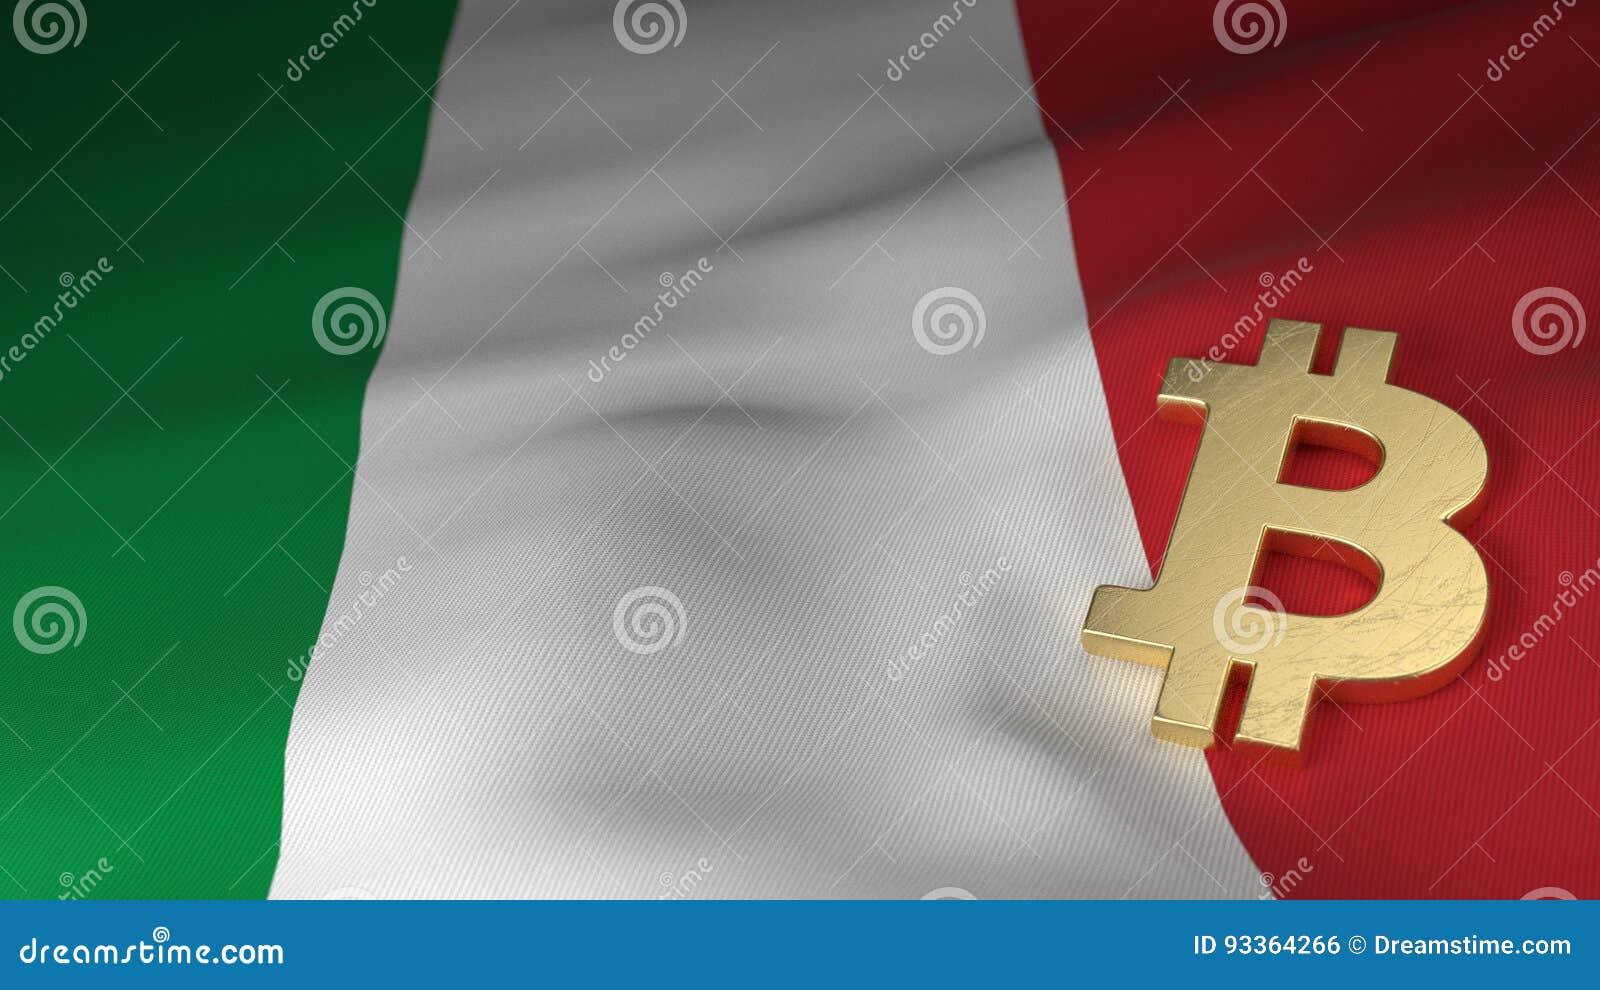 bitcoin italia)